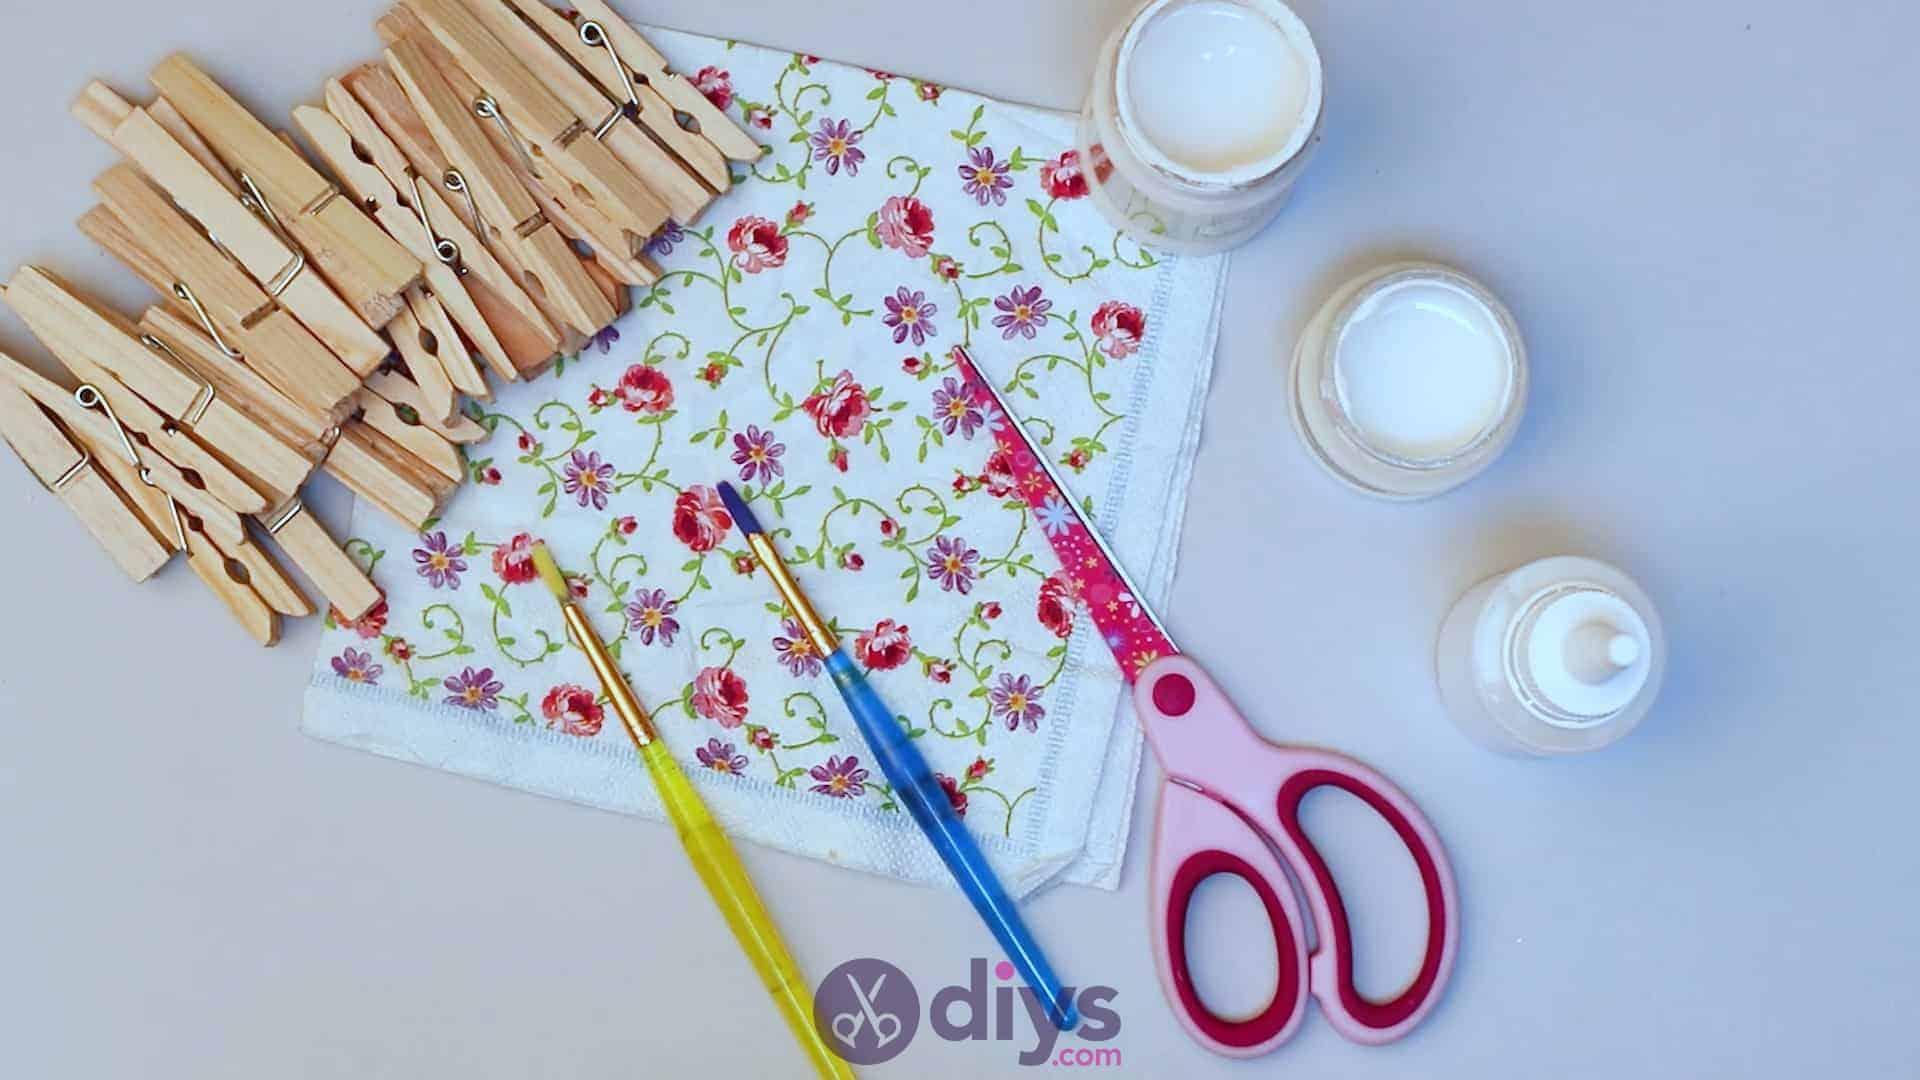 Diy clothespin napkin holder materials